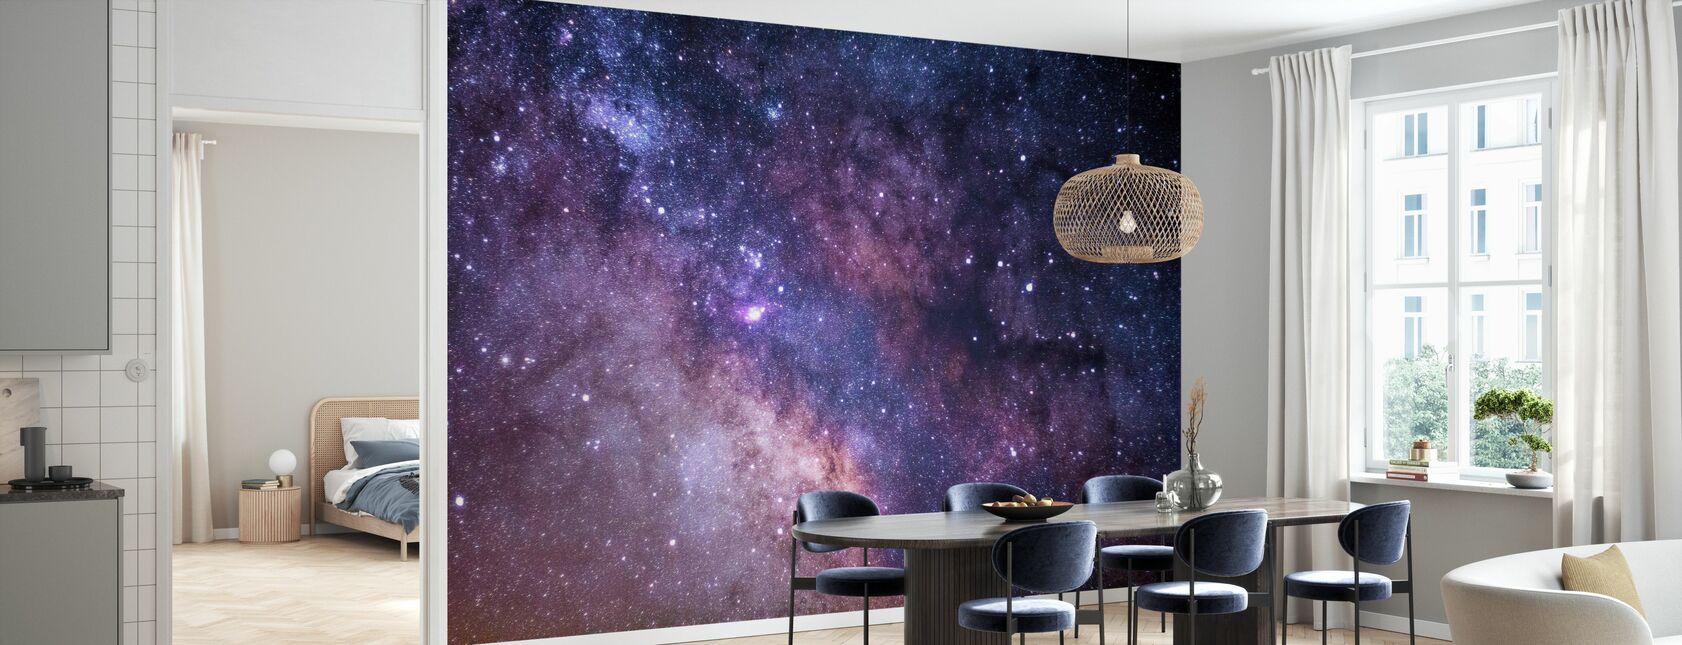 Galaxy - Wallpaper - Kitchen